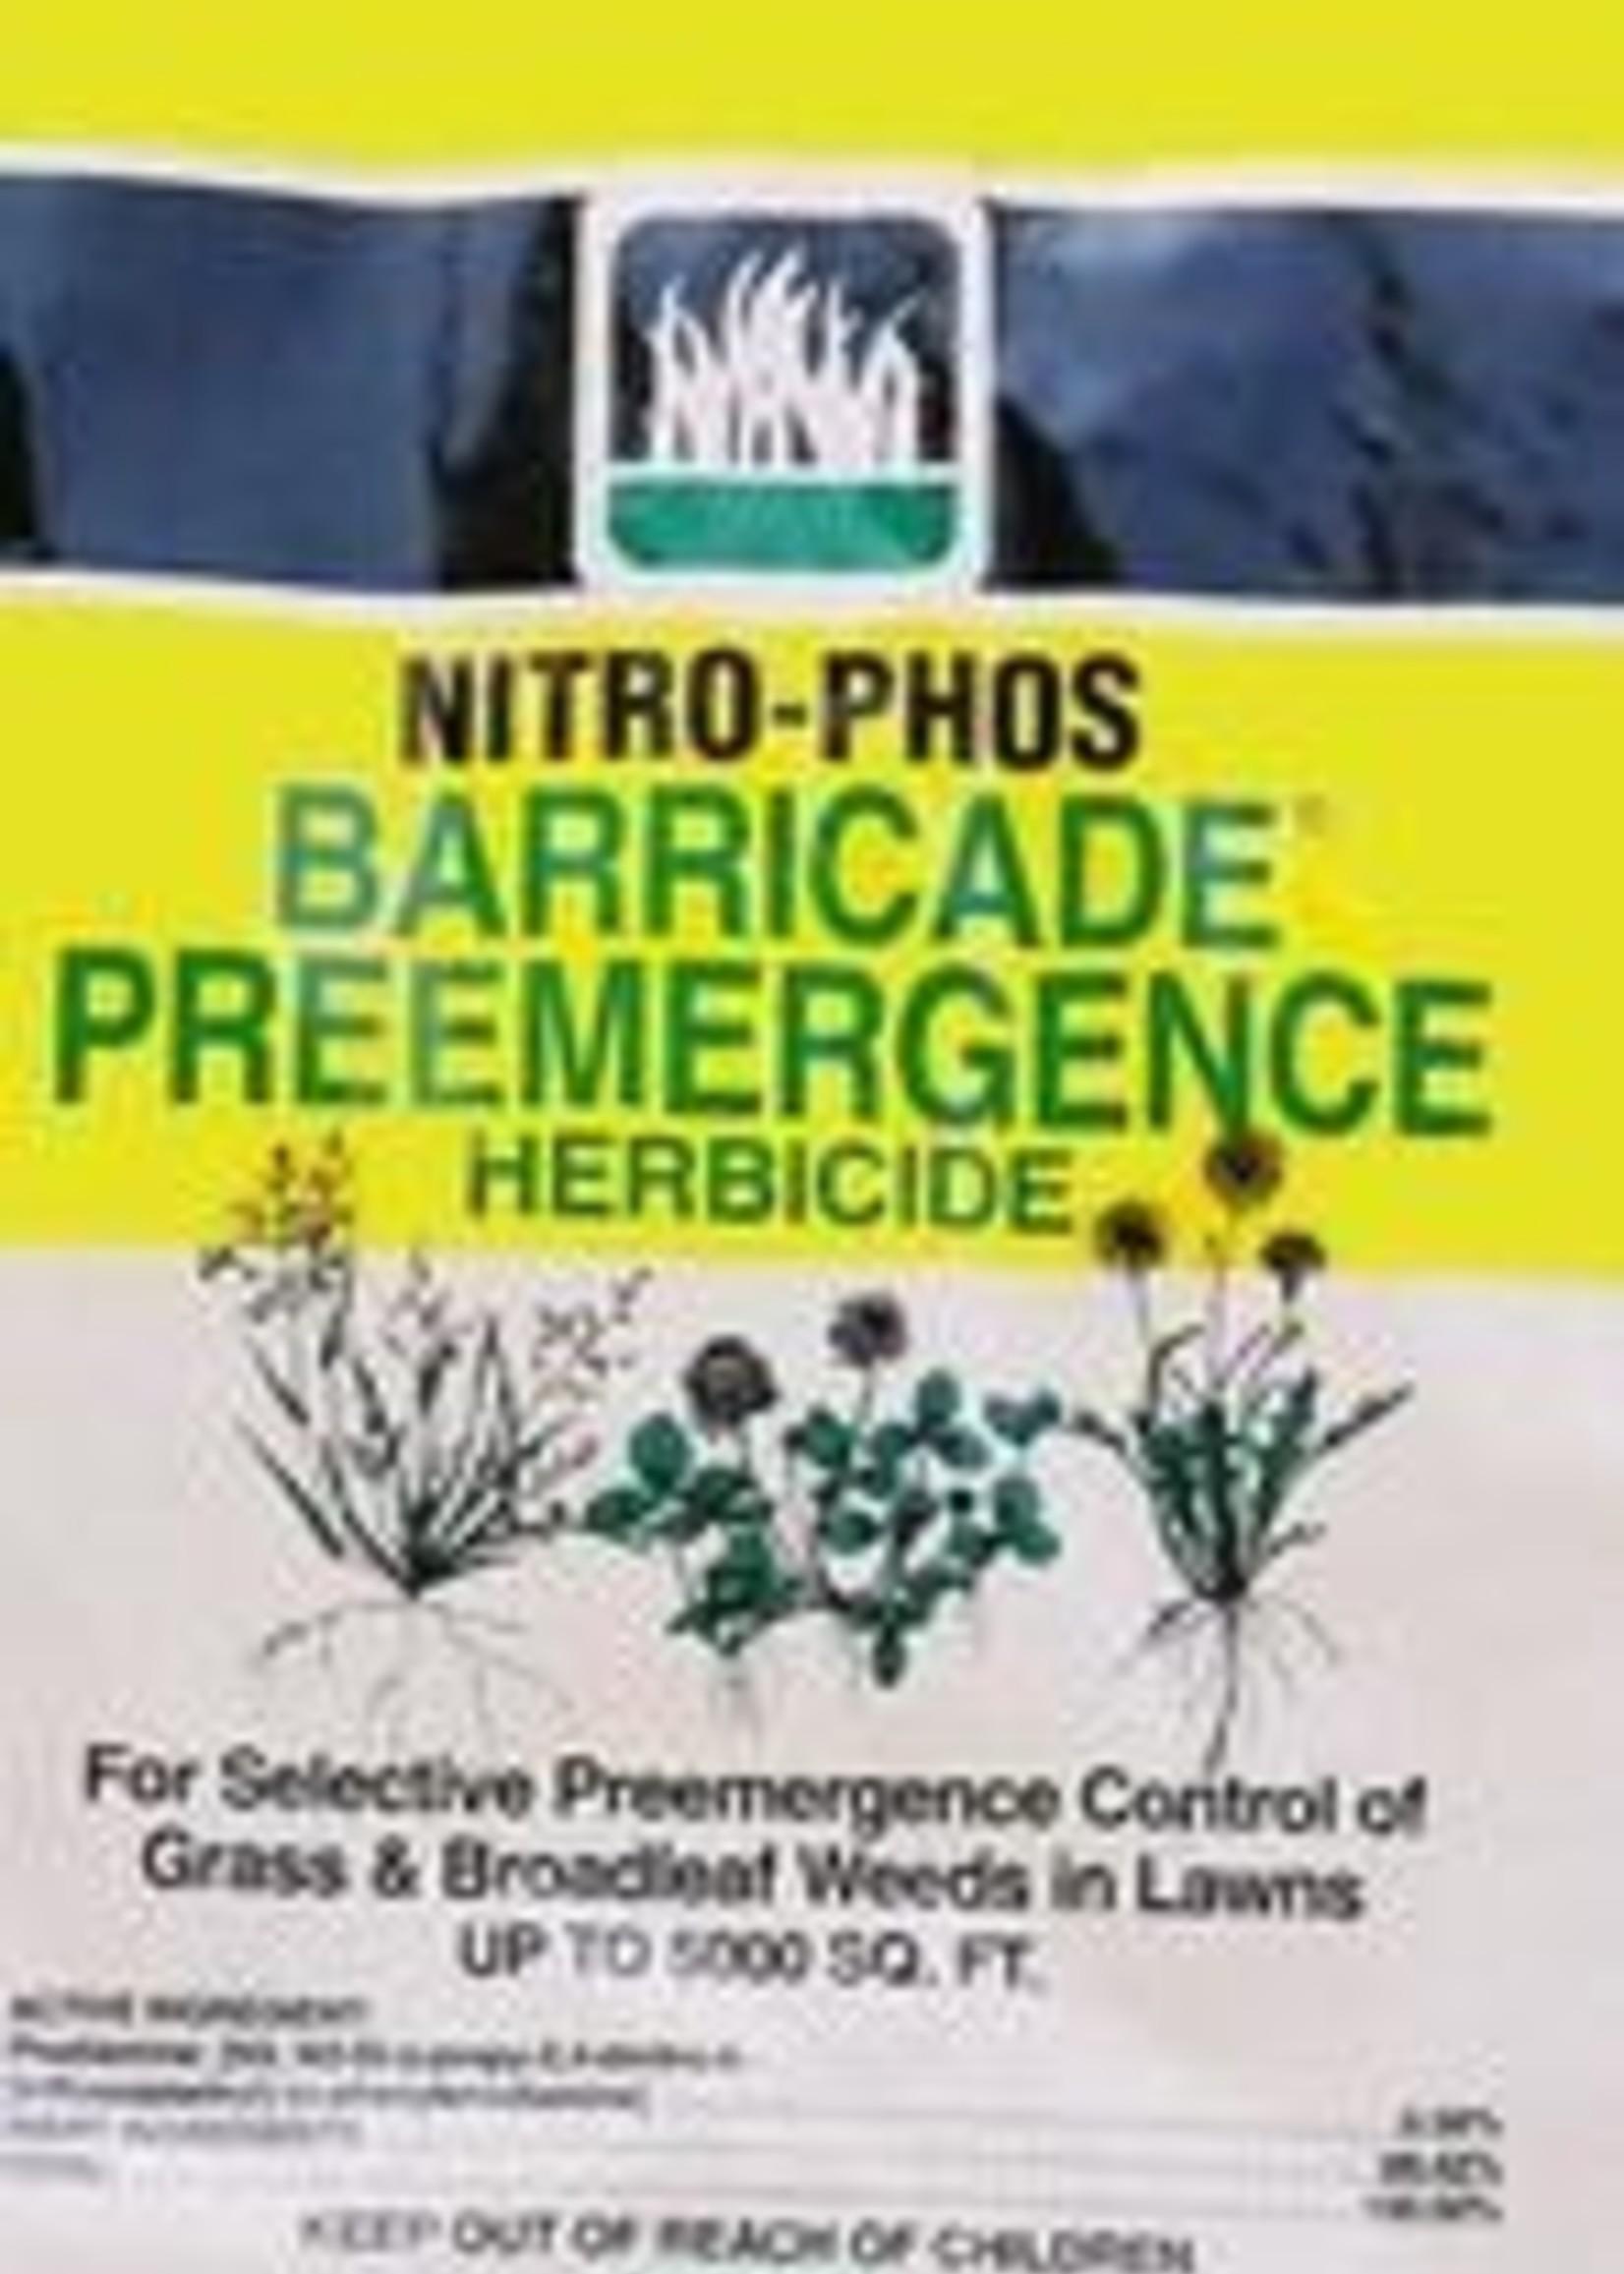 NITRO PHOS BARRICADE 50 lb. 12500 SF coverage